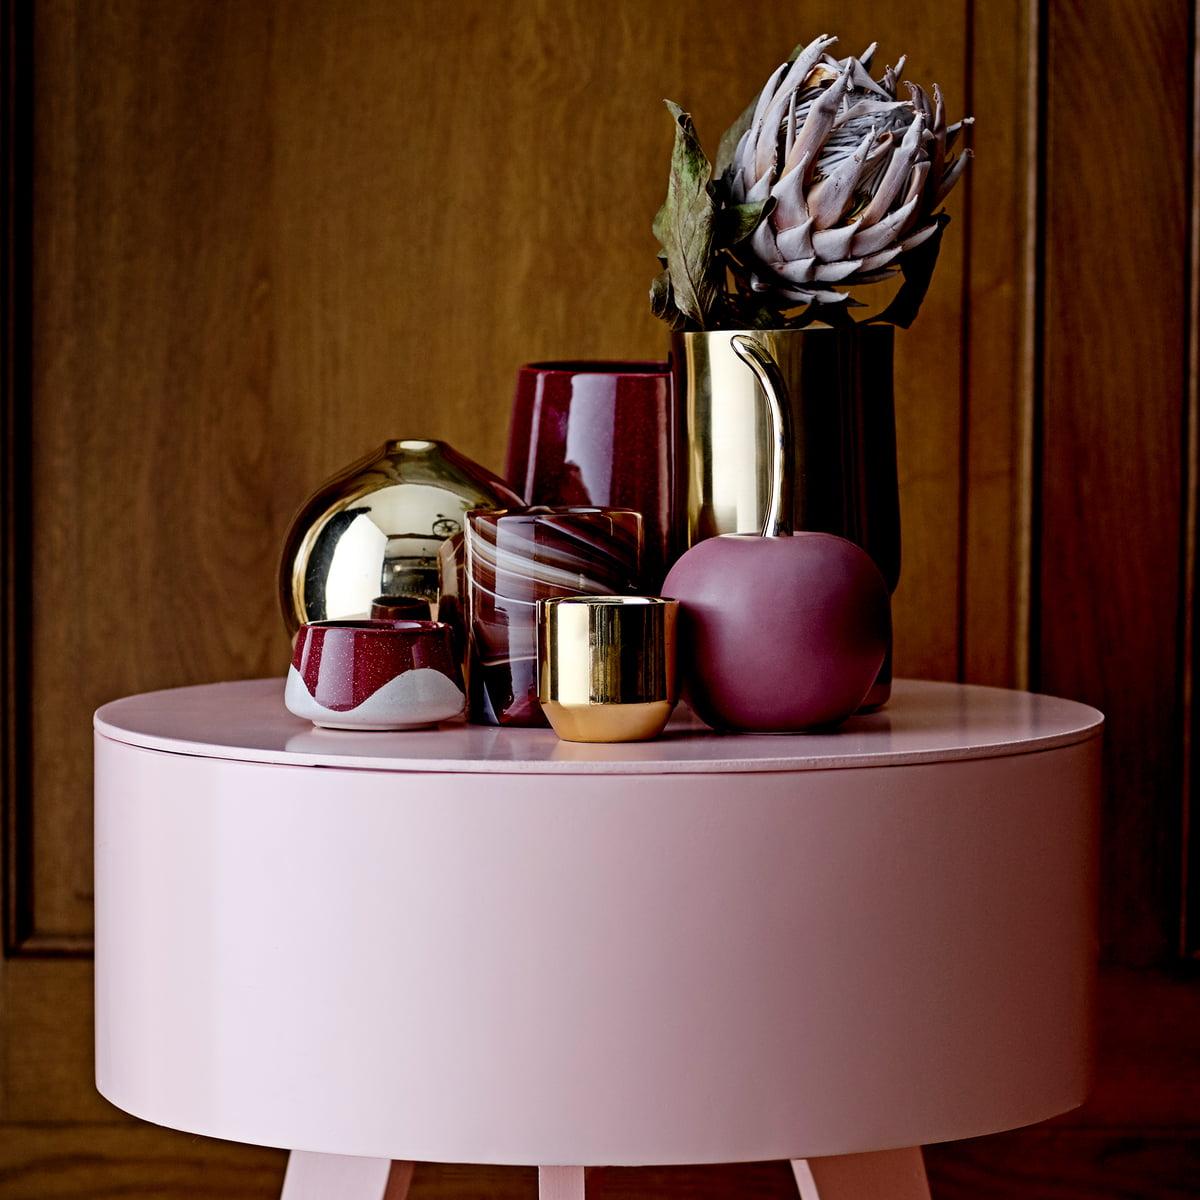 Decorative cherry by bloomingville connox for Kirsche deko